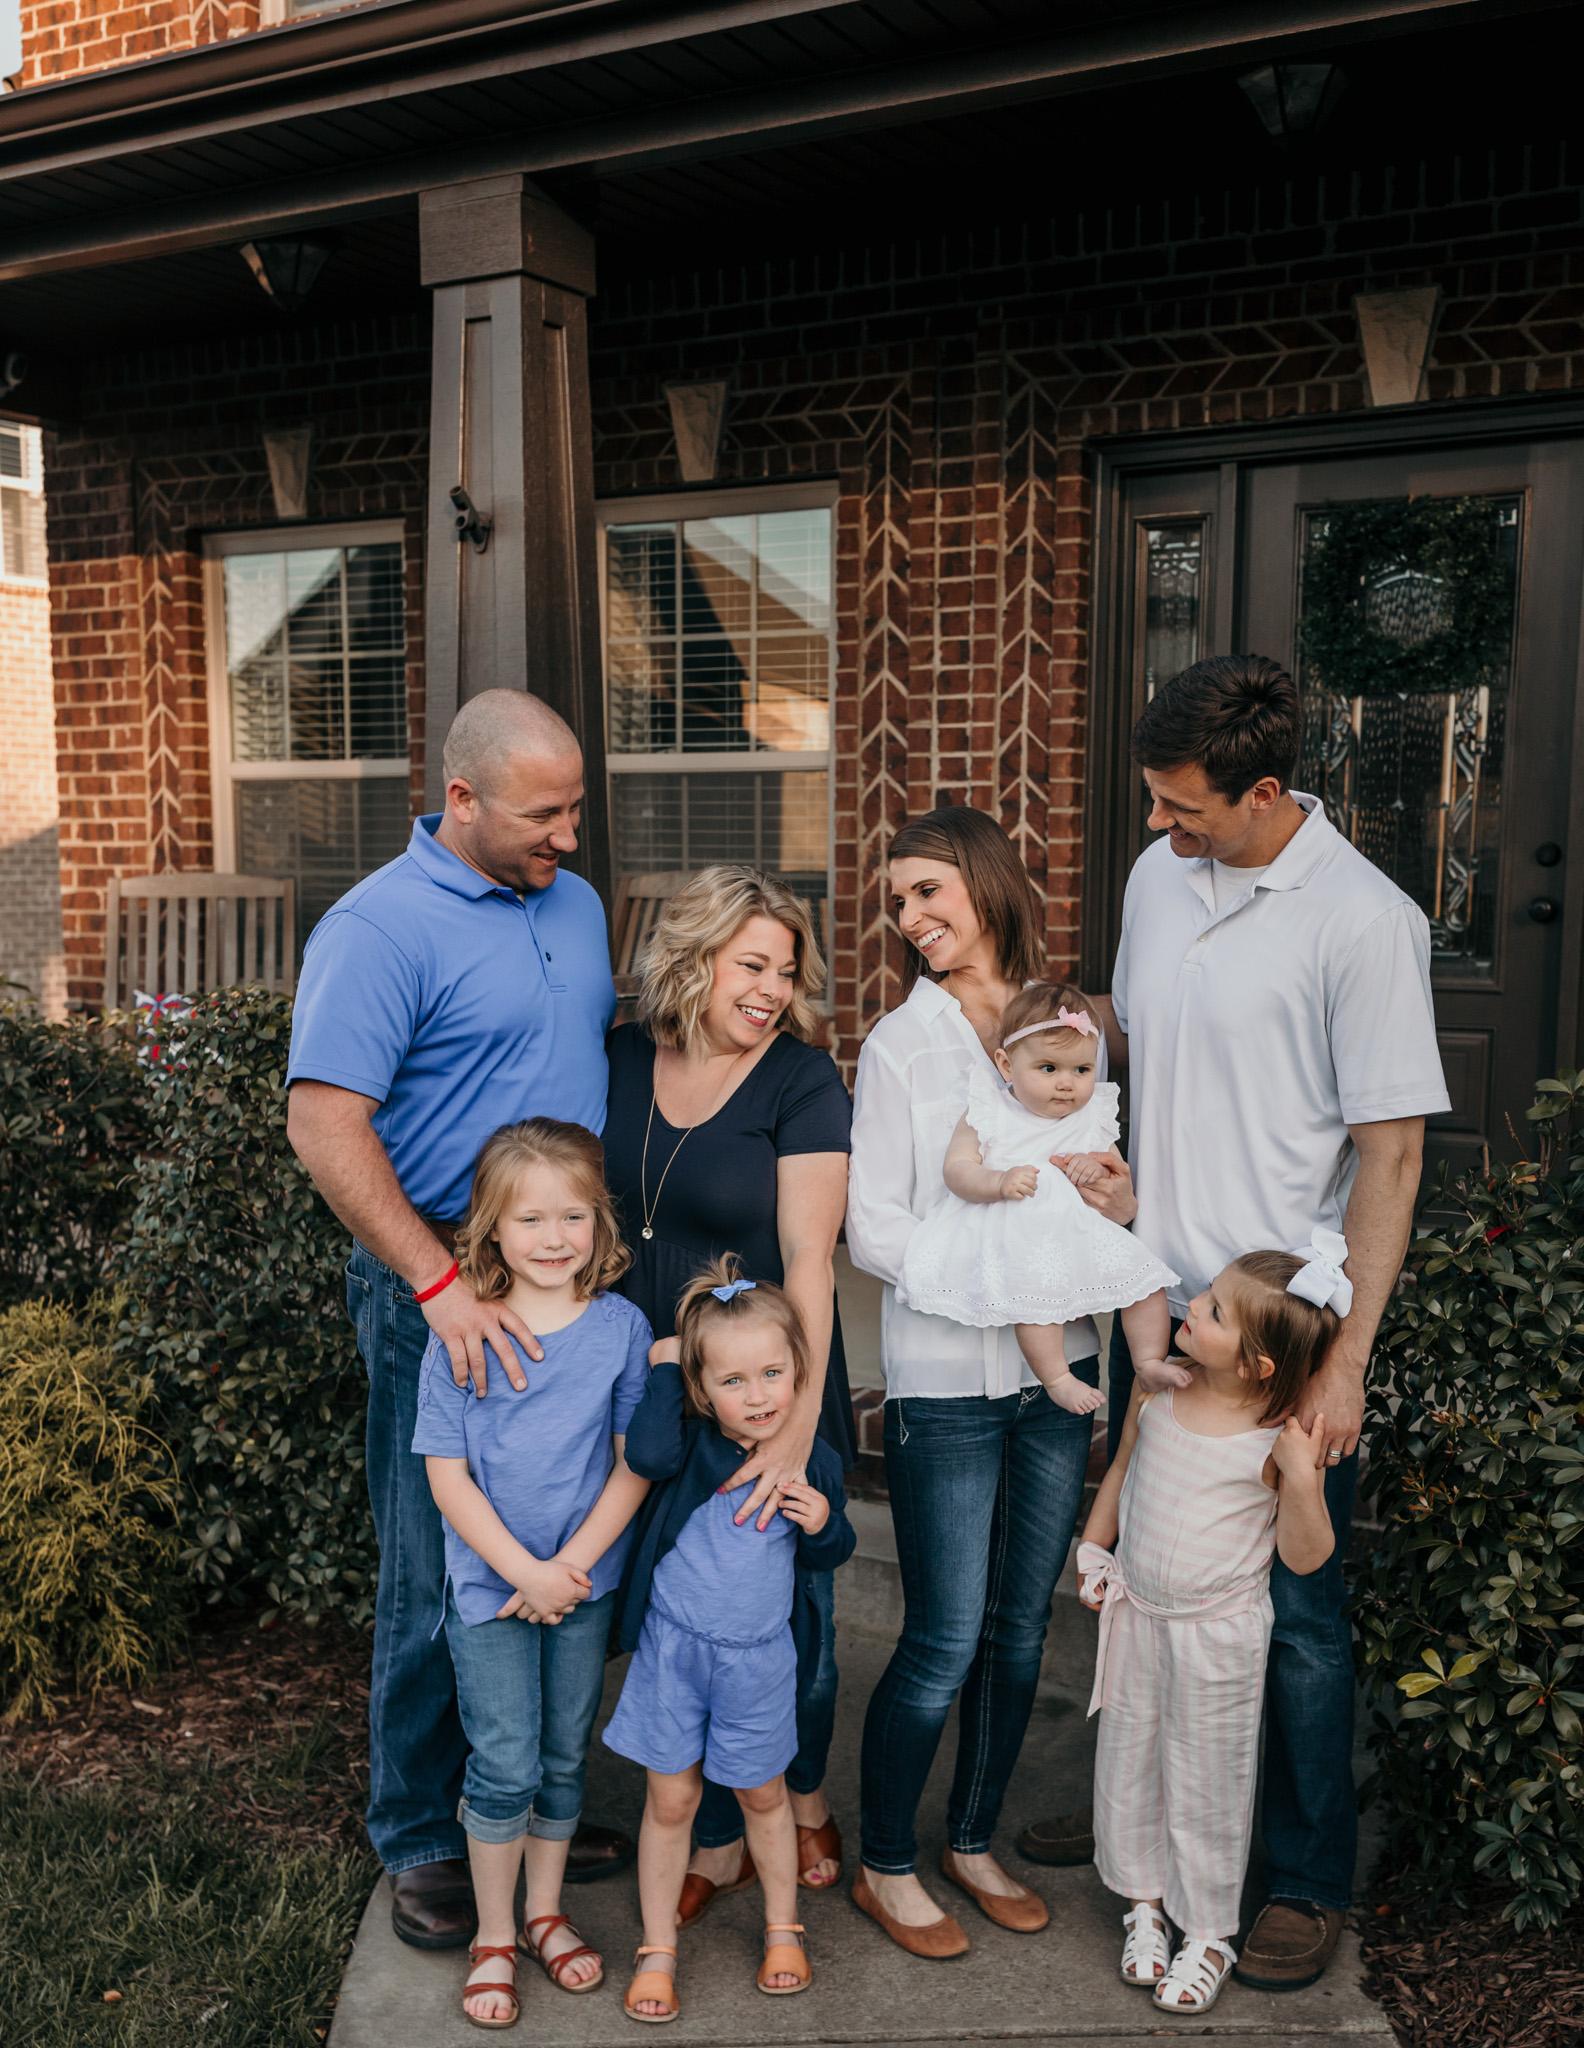 Clarksville Family Standing Outside